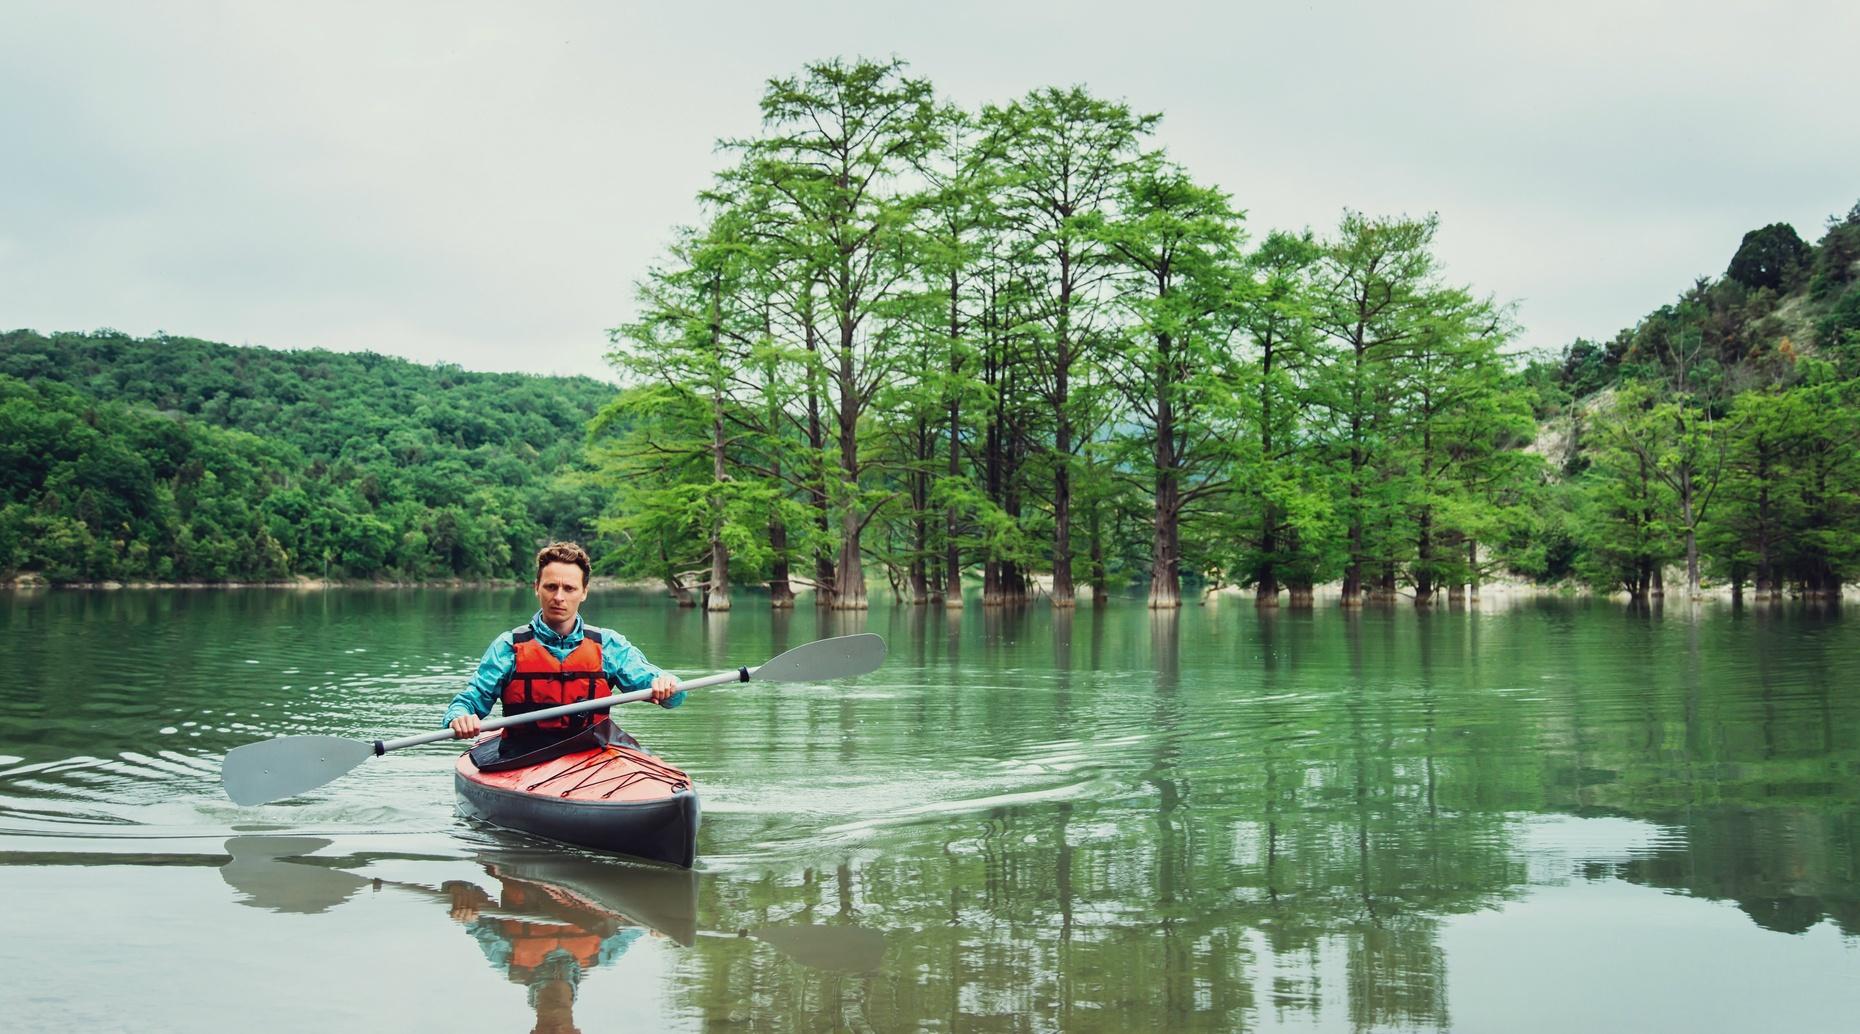 Tar River Single Kayak Tour in Bunn